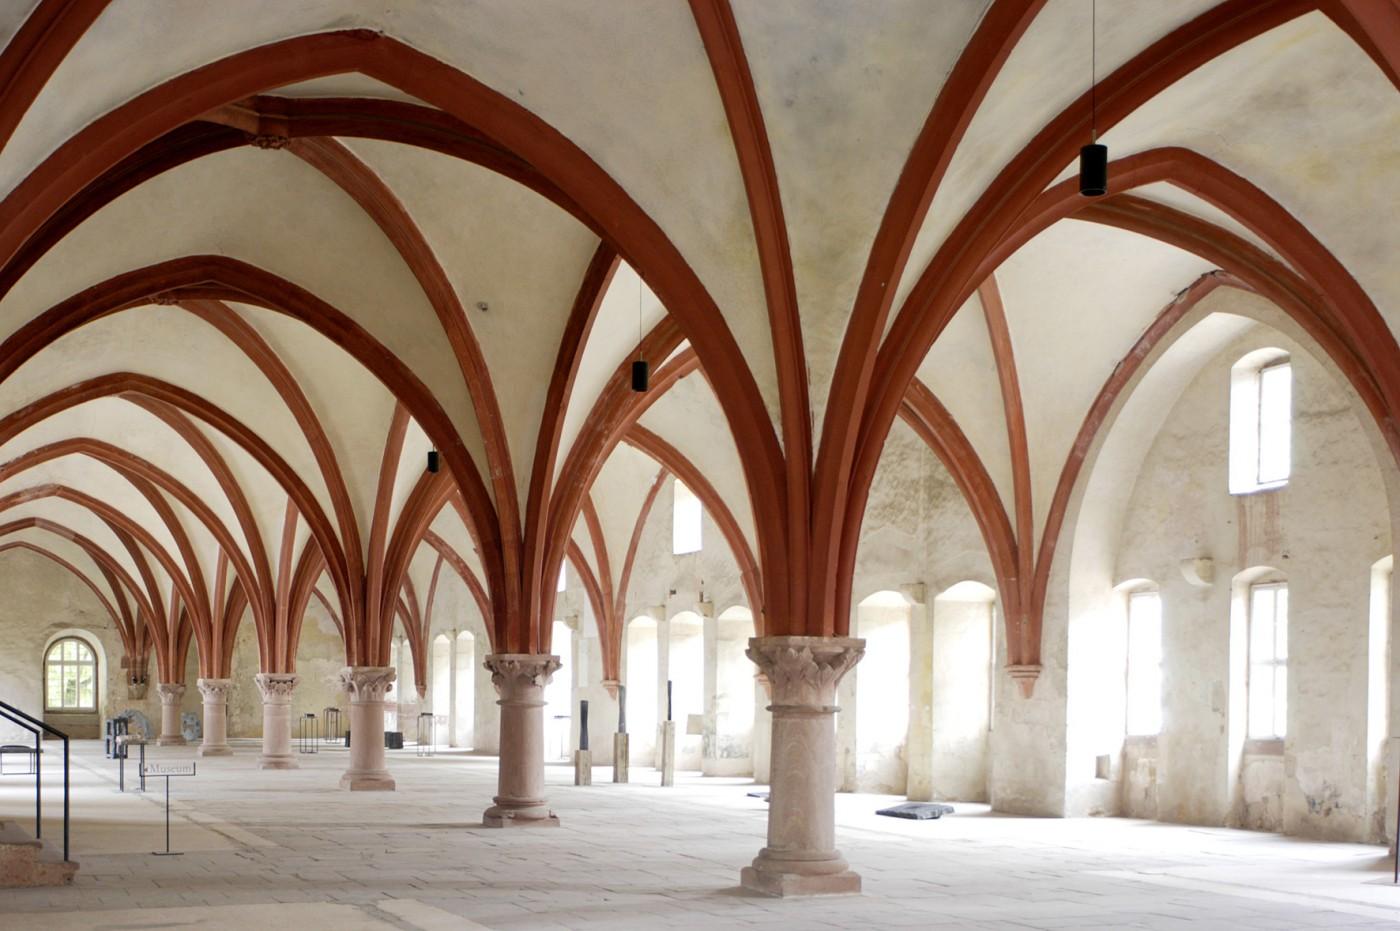 moenchsdormitorium-c-stiftung-kloster-eberbach